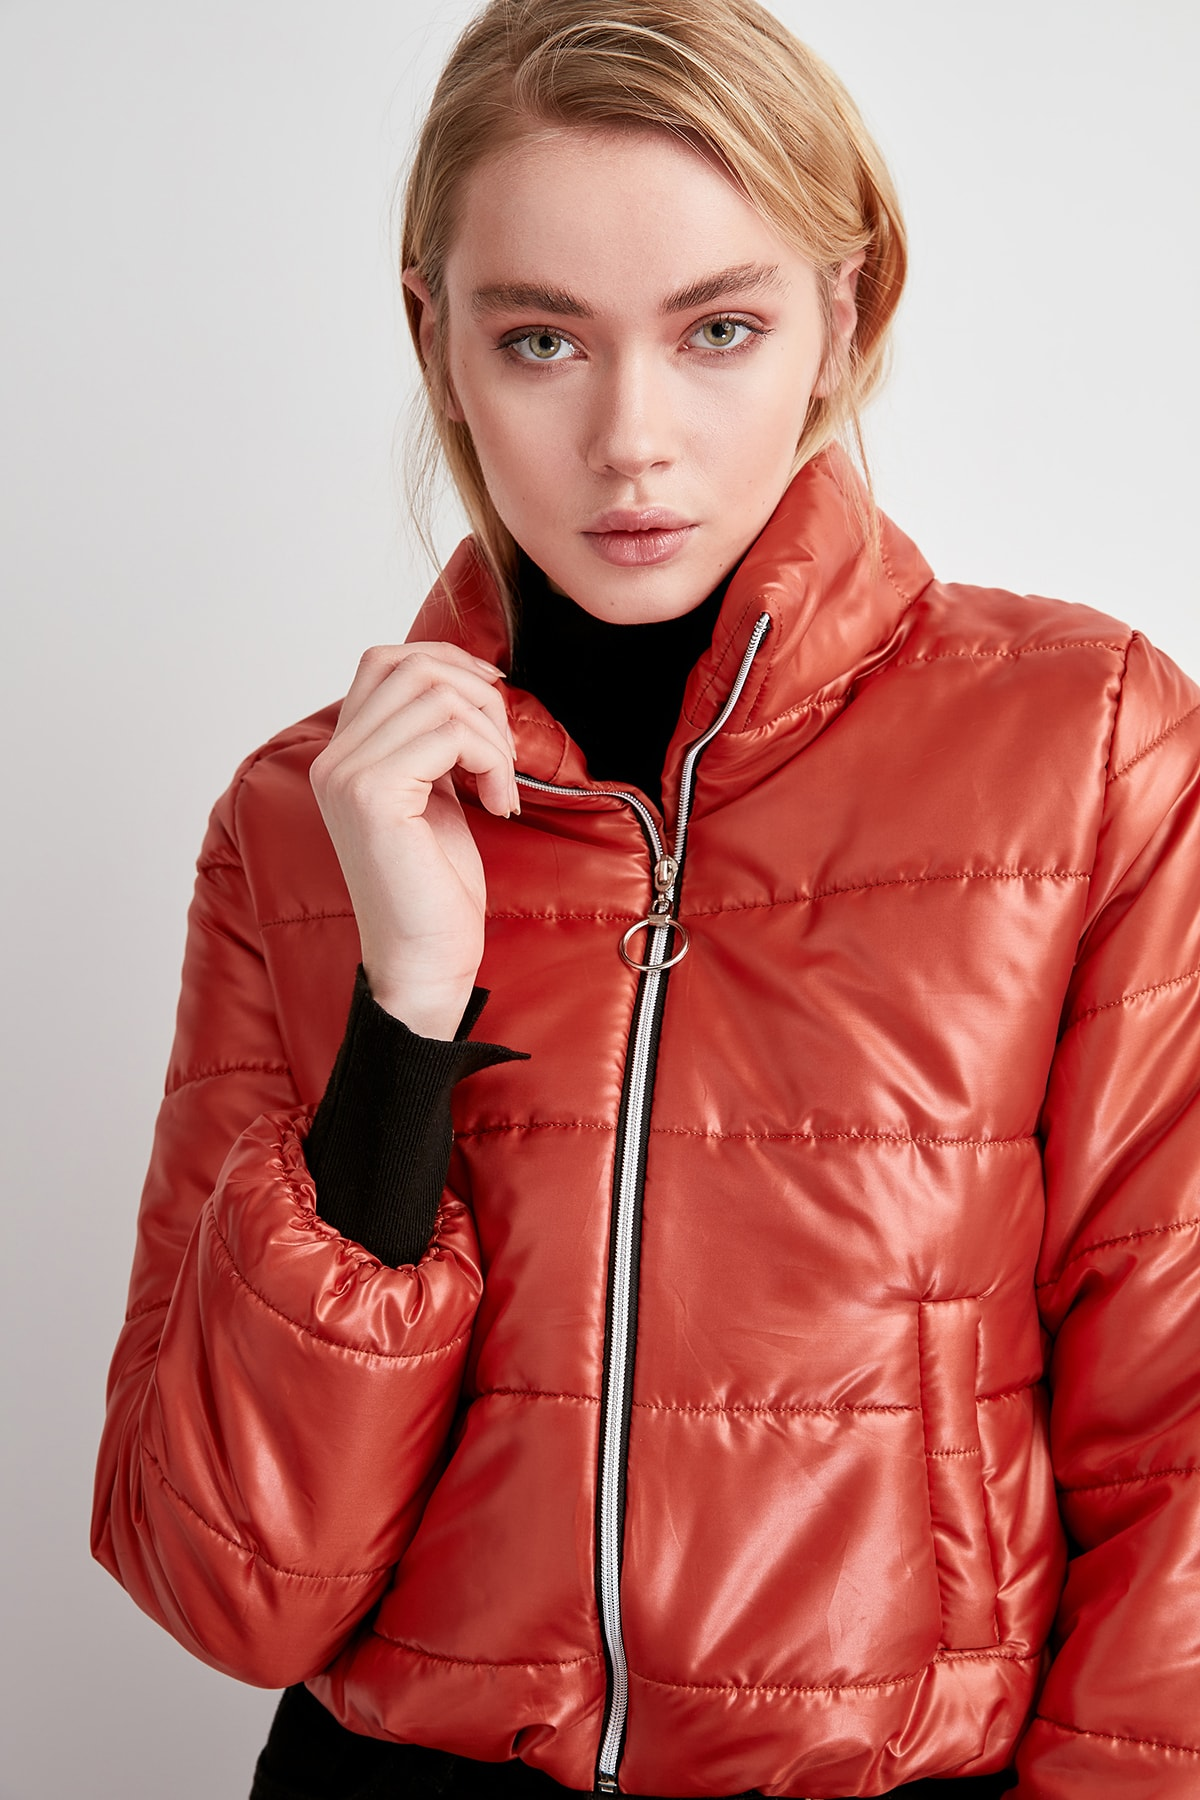 Trendyol Damson Zipper It Should Cover Upright Collar Inflatable Crop coats TWOAW20MO0088 Jackets    - AliExpress